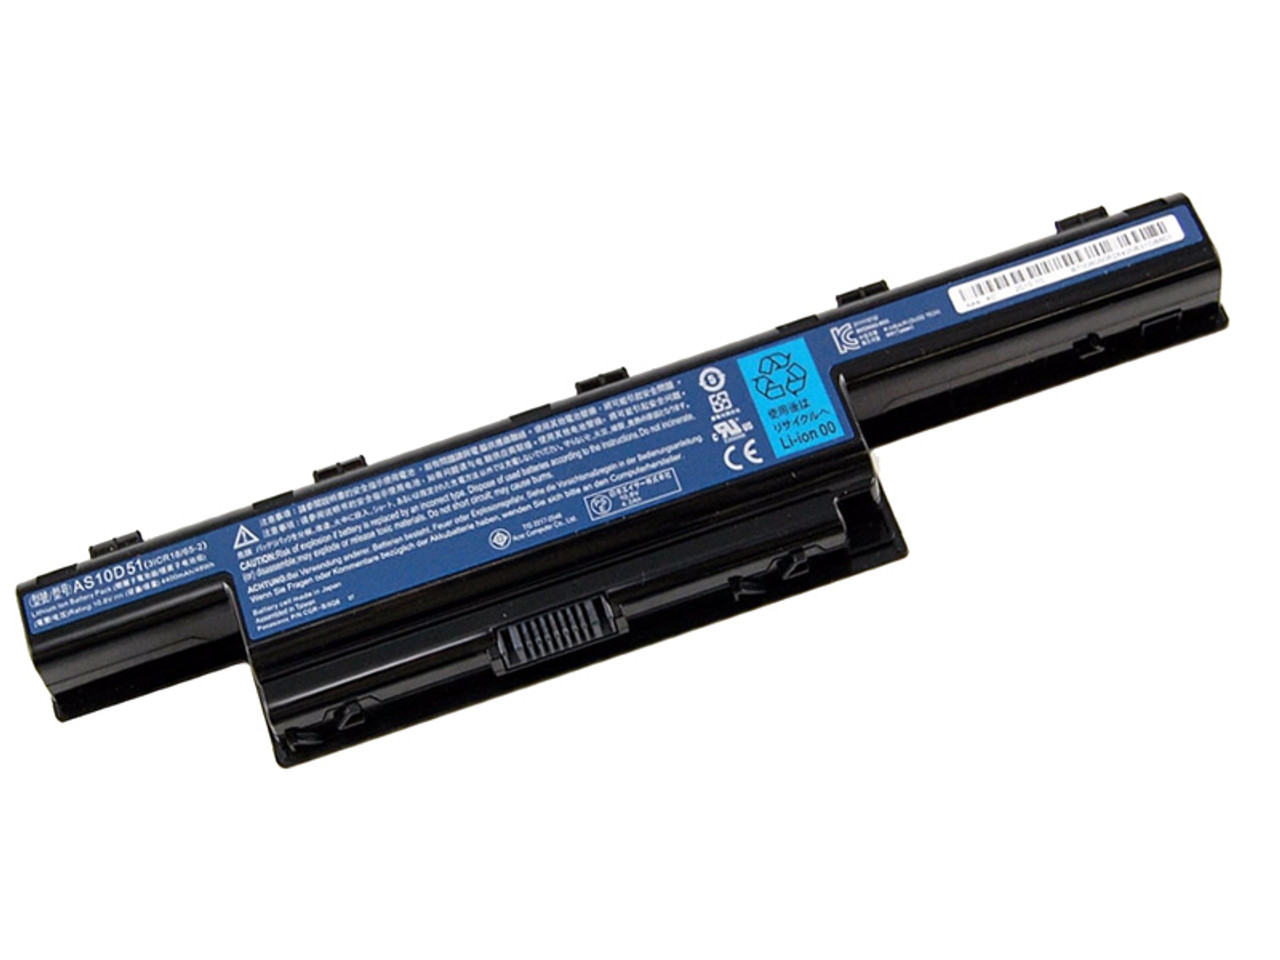 New Laptop US Keyboard for Acer Aspire V3-571G V3-571G V3-571G-6407 V3-571-6422